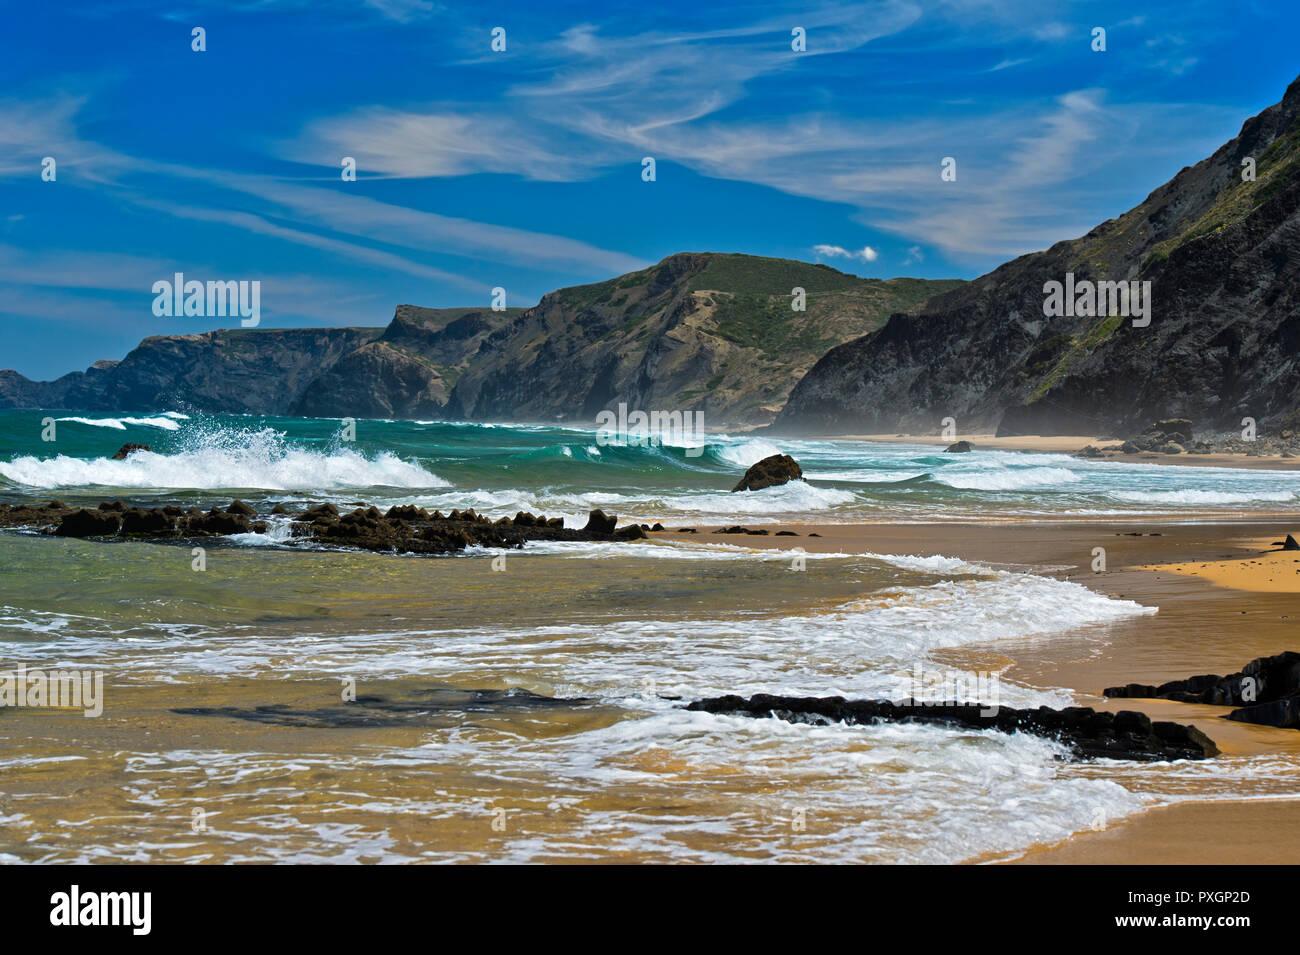 Breakers at the stormy Costa Vicentina coast, Vila do Bispo, Portugal - Stock Image